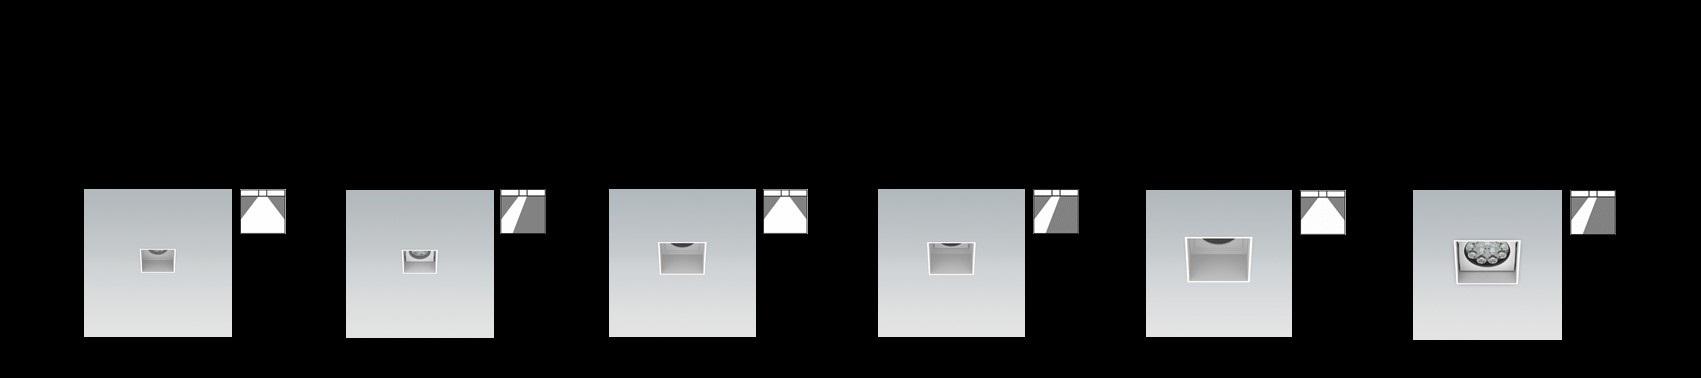 10.afb-header-lucent-lighting-soft-square-trimless-zwart-website